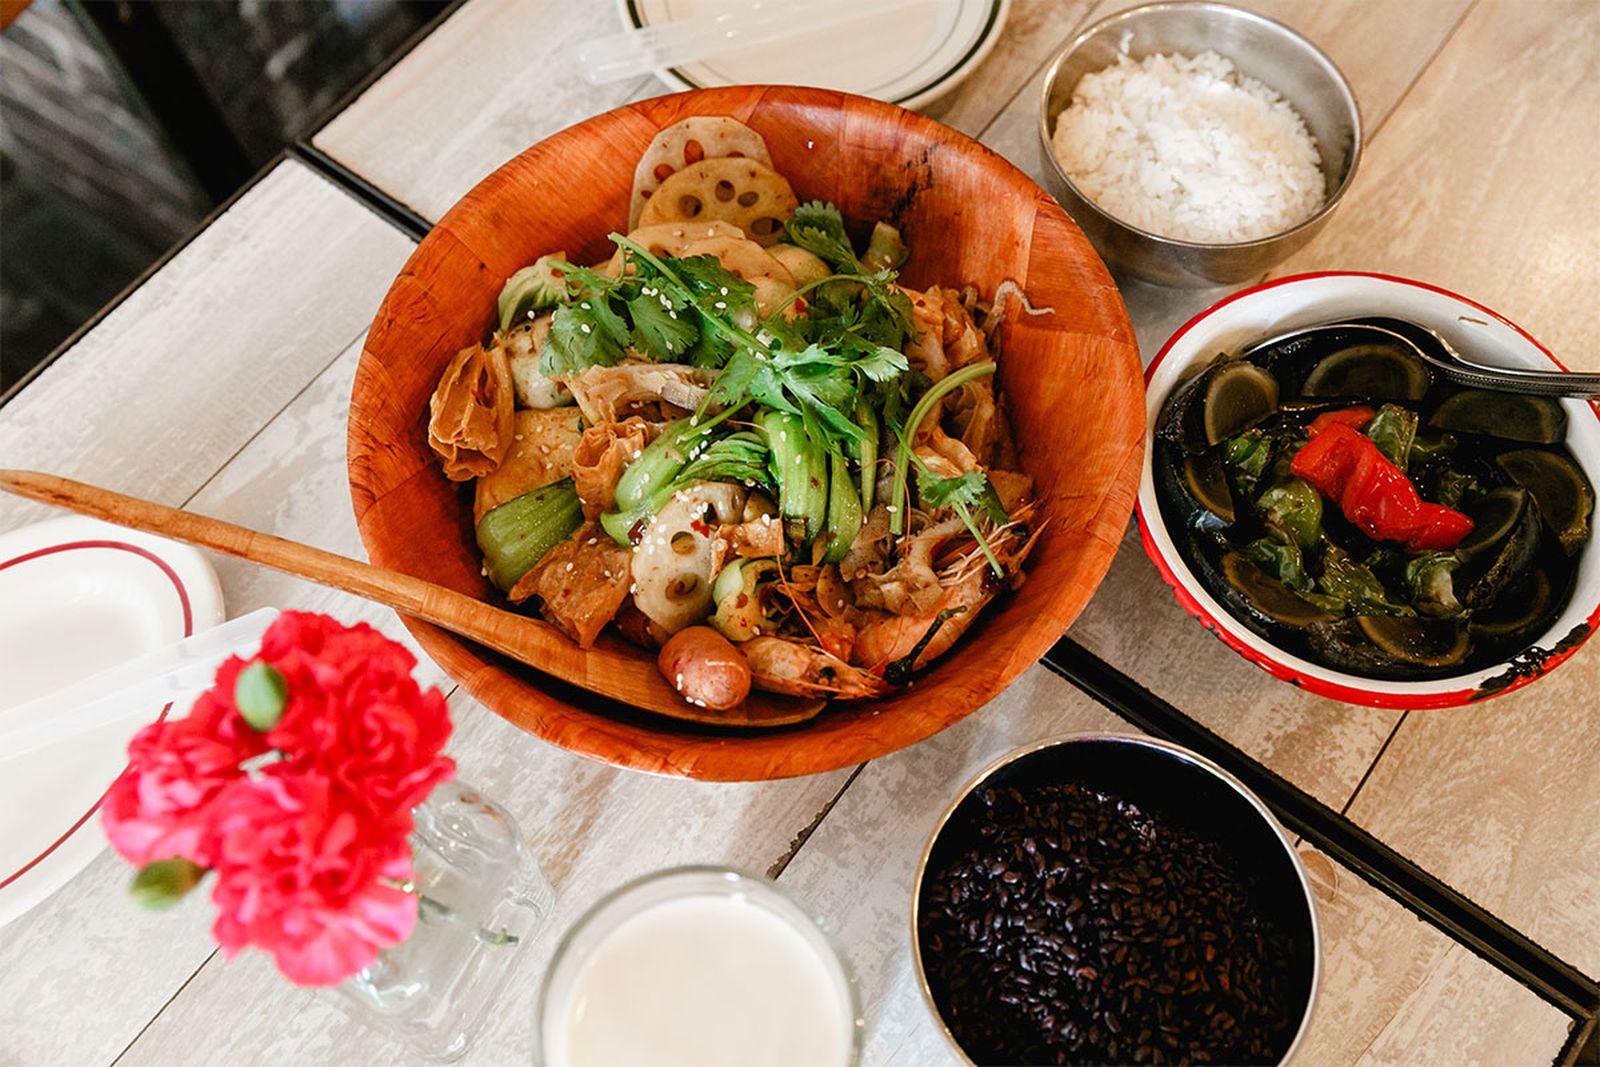 nyc mid range restaurants mala project AMEX american express platinum food & drink